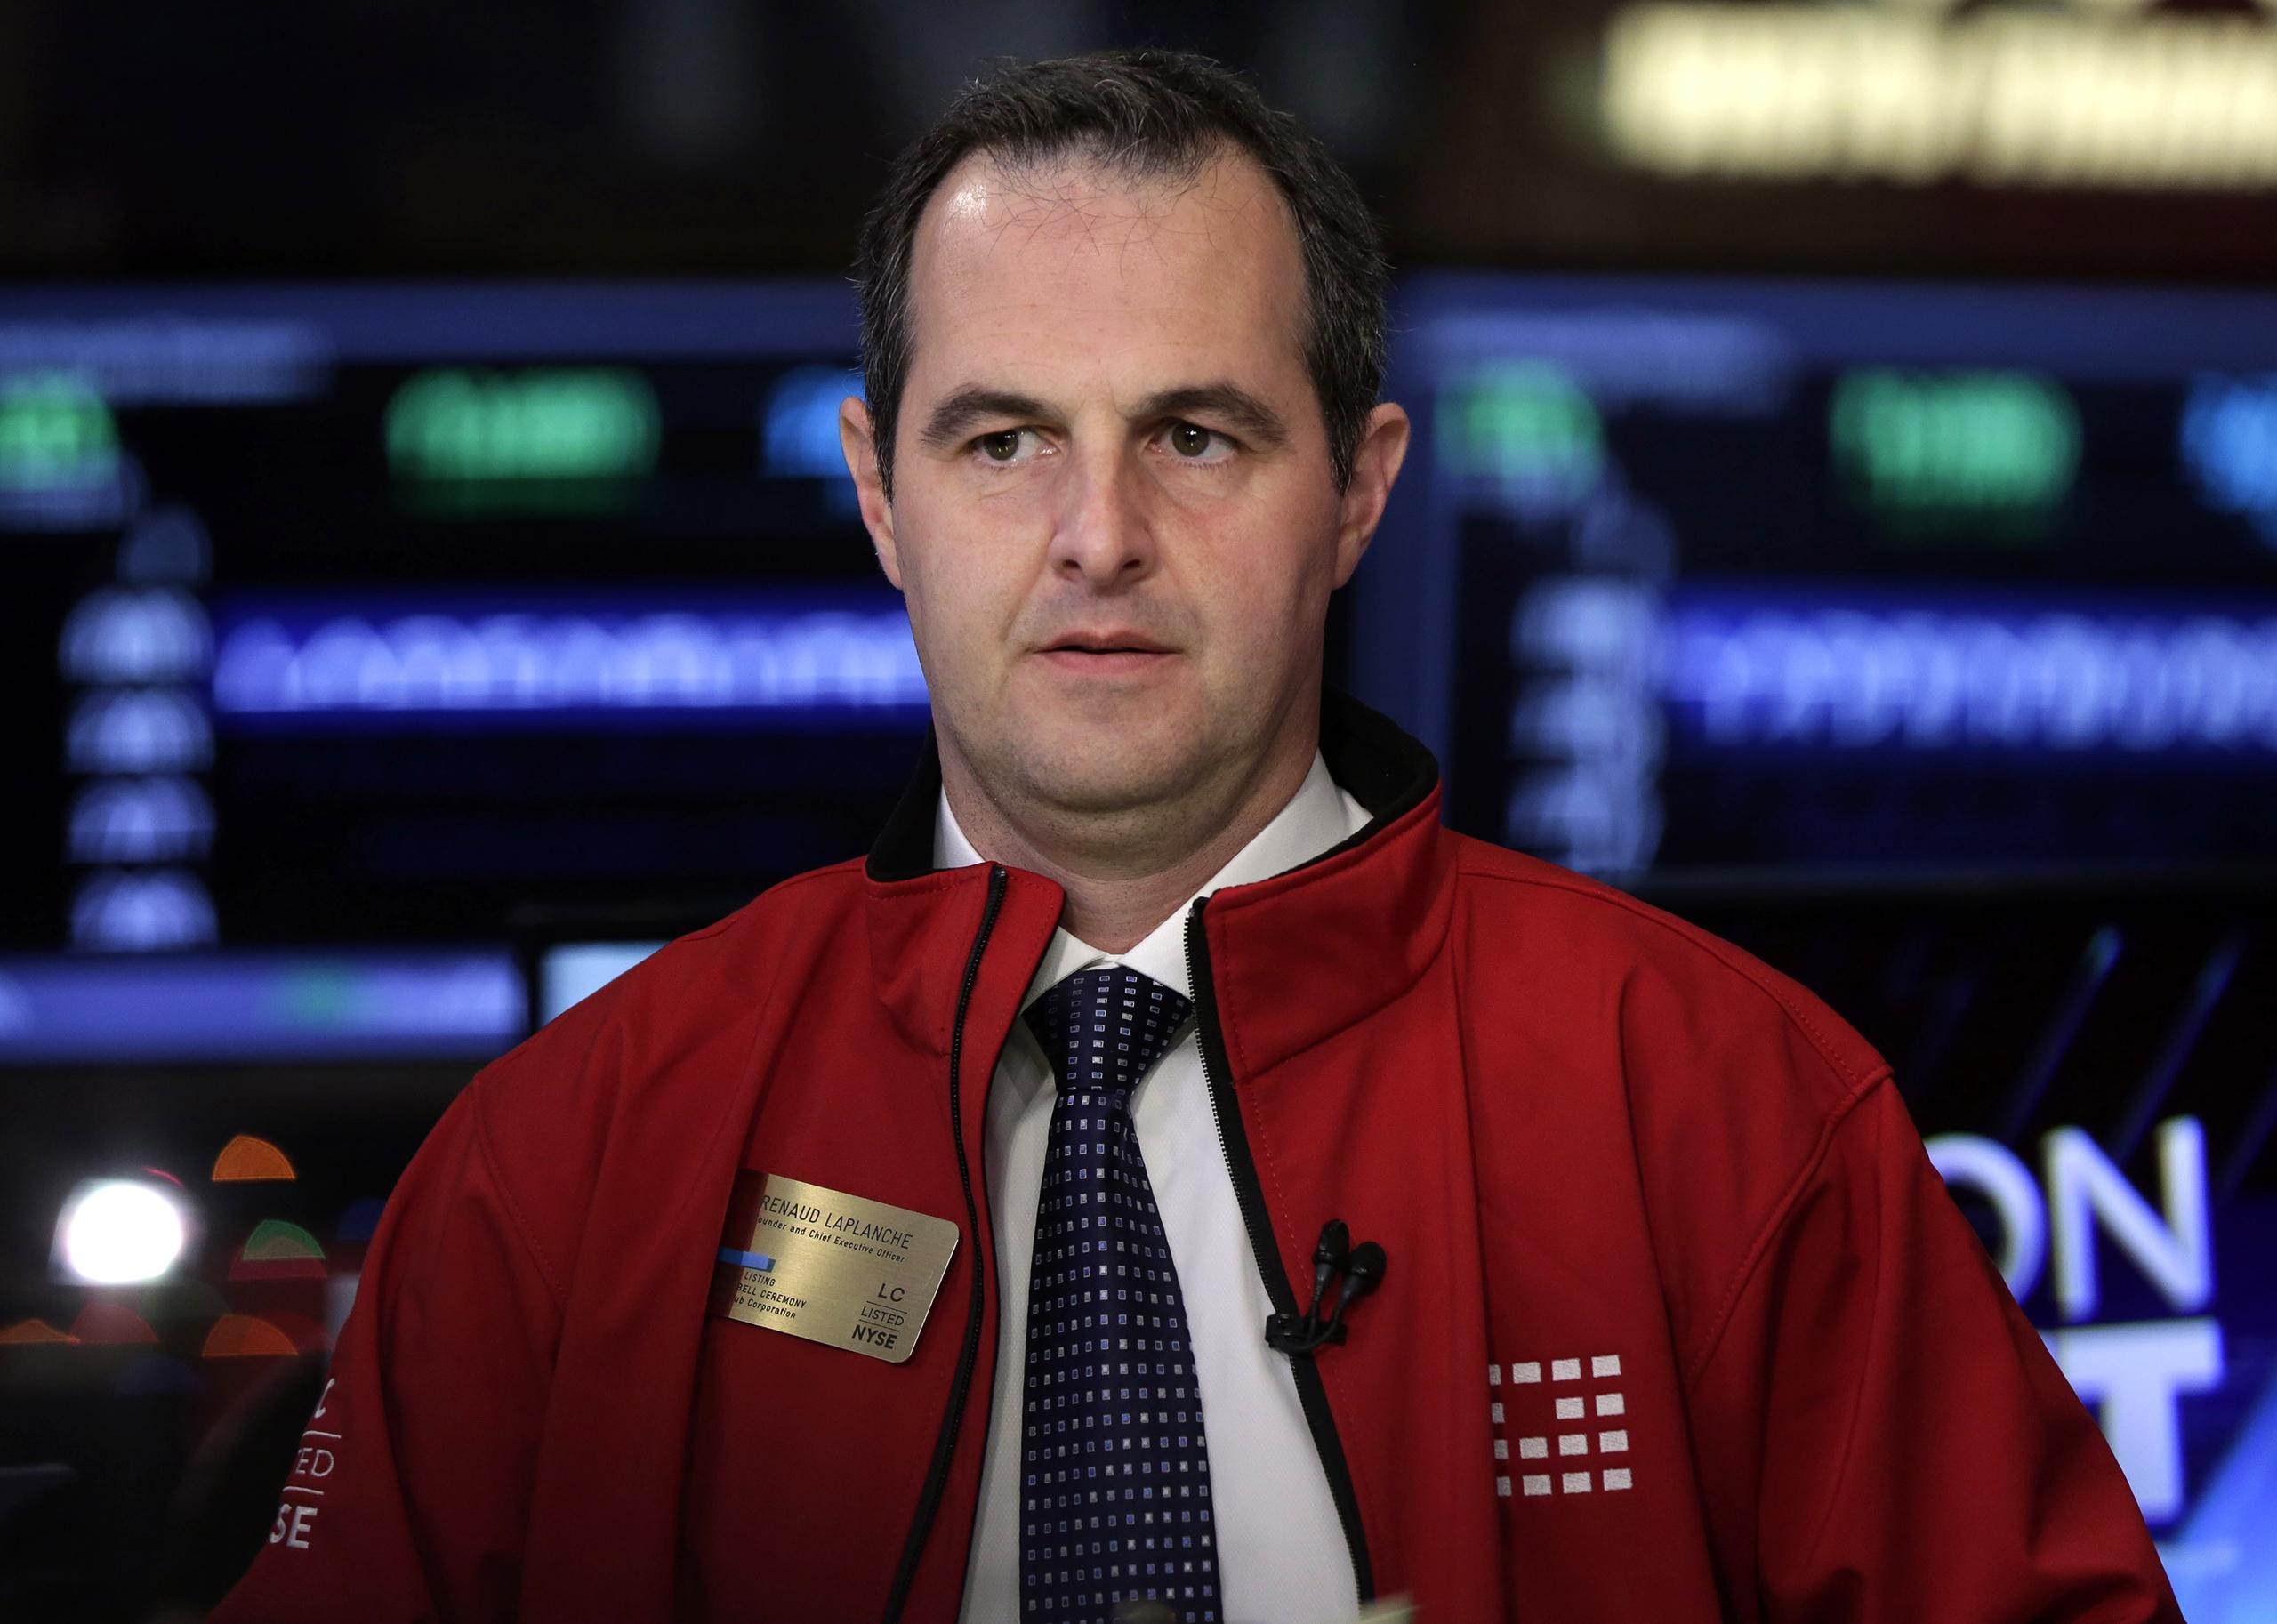 Renaud Laplanche on the floor of the New York Stock Exchange, Dec. 11, 2014.